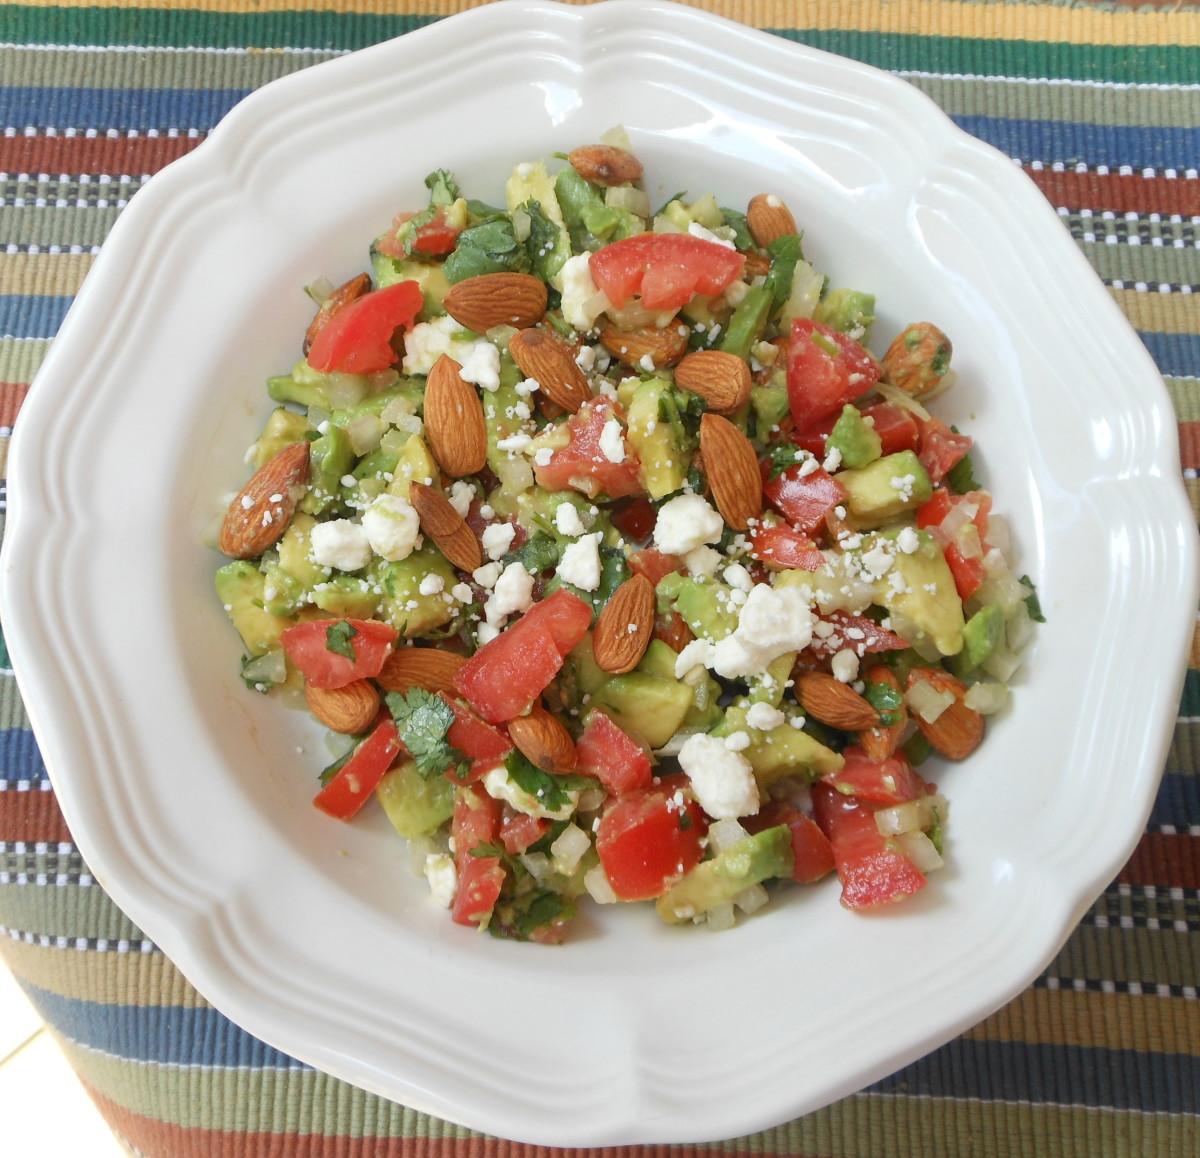 Avocado, Almond and Feta Cheese Salad